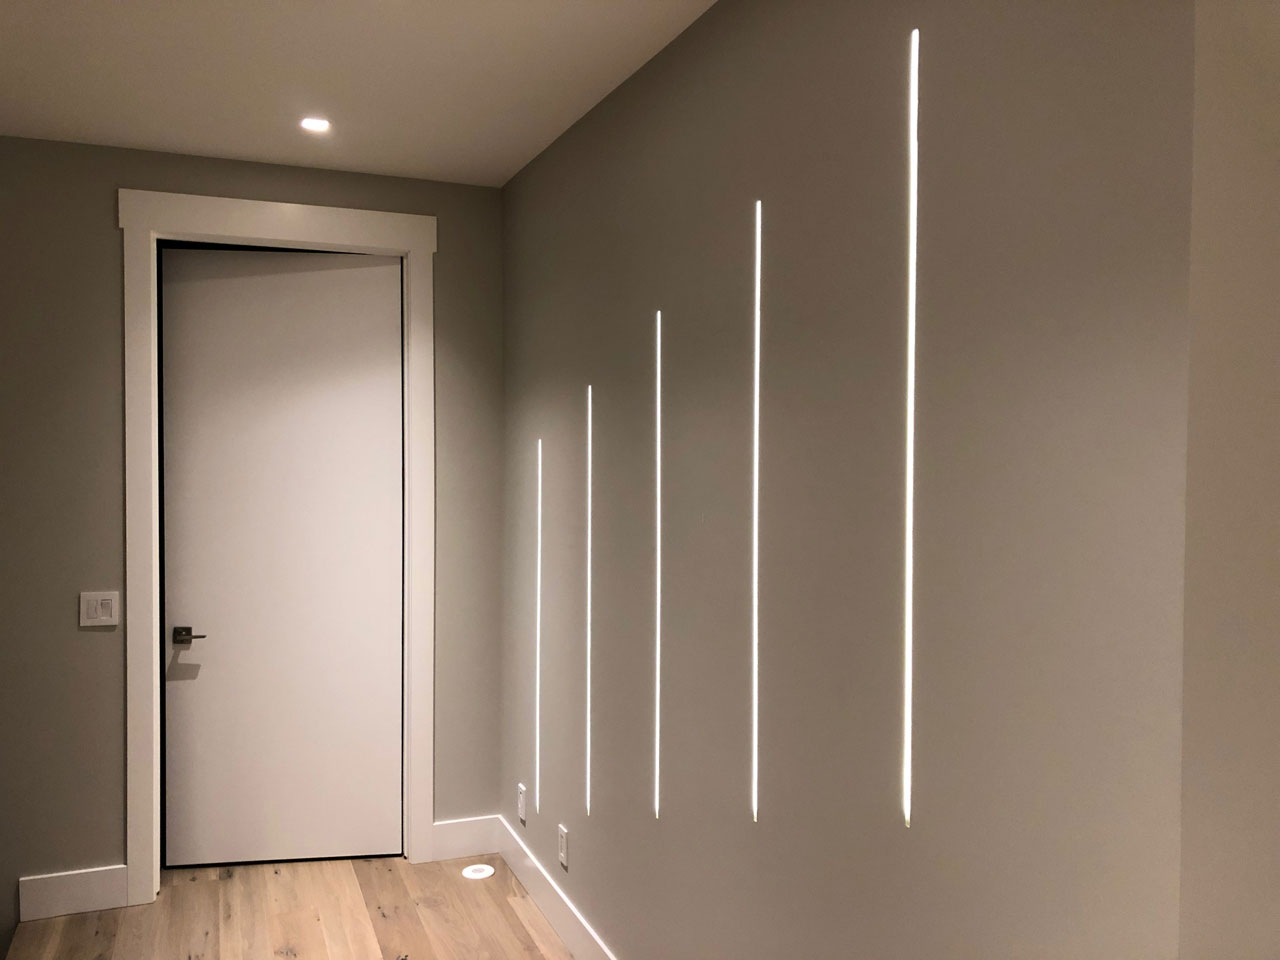 UNITI-LE-120-Wall-Decor-Lighting.jpg